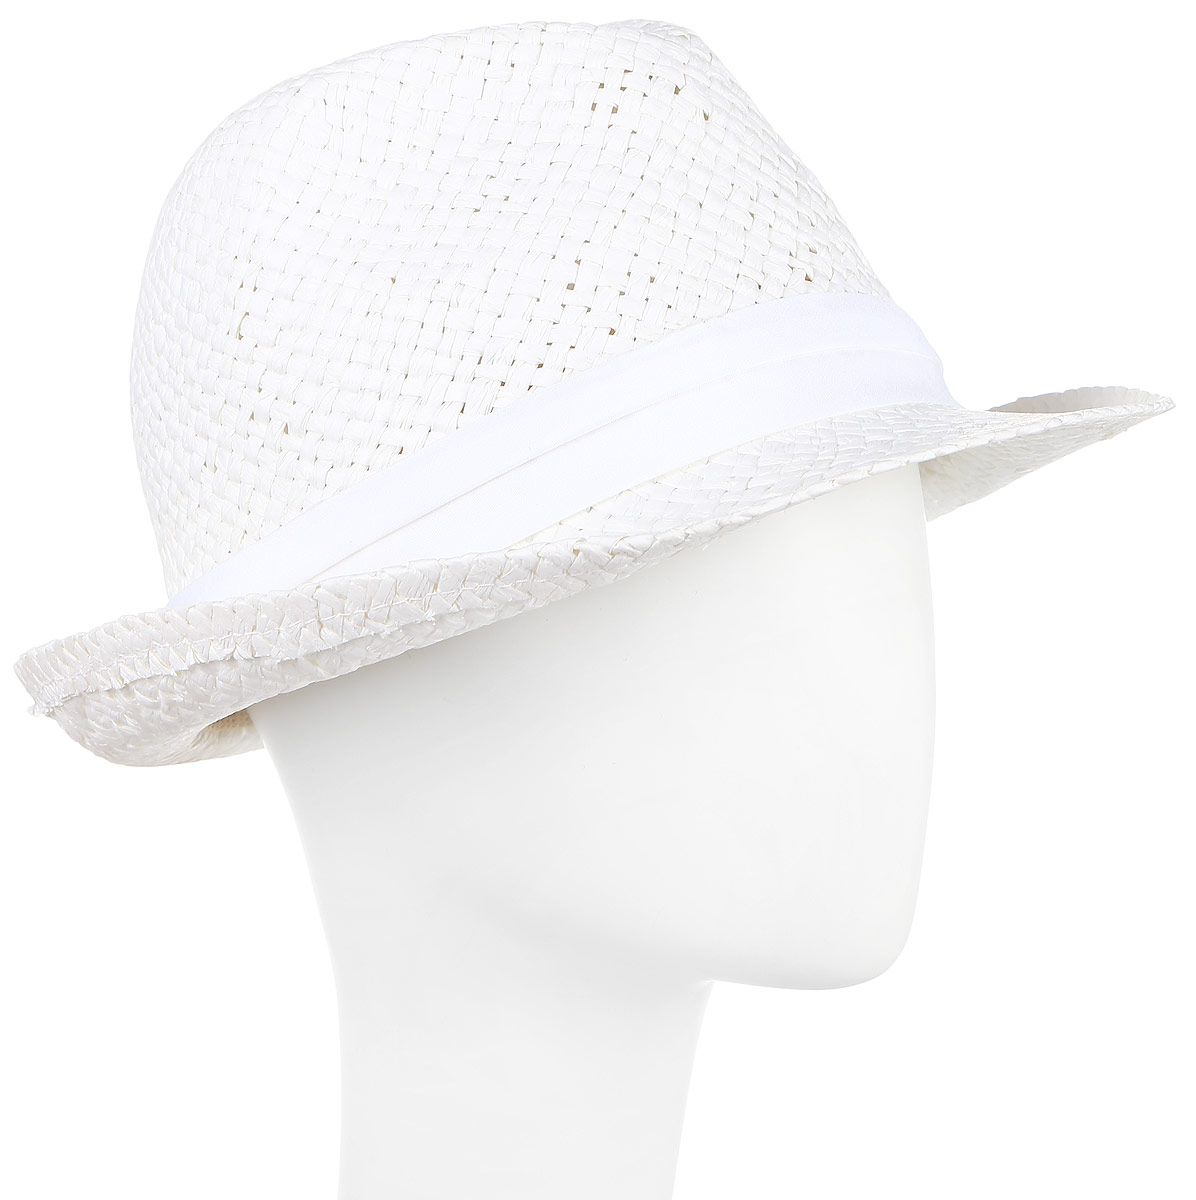 Шляпа муж Imojo, цвет: белый. HtY131004. Размер 58HtY131004Молодежная шляпа с ремешком.